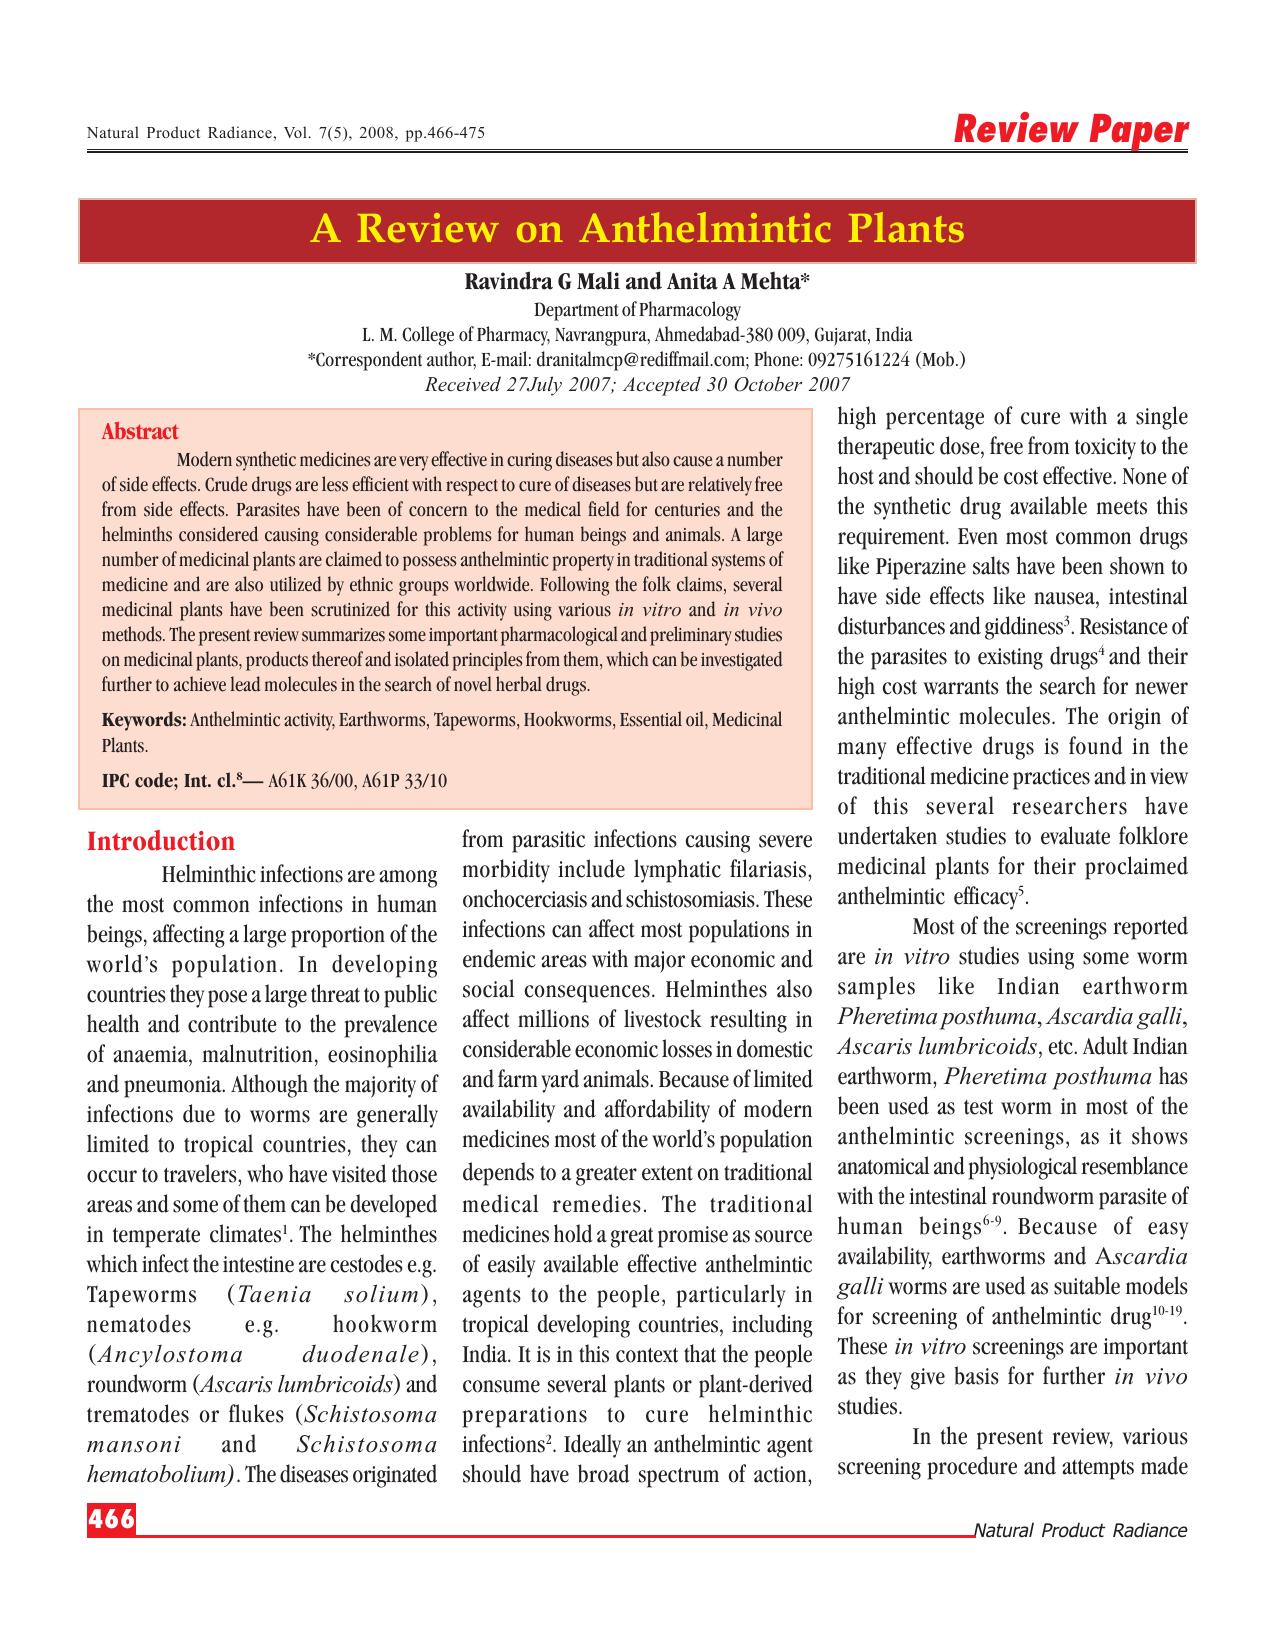 anthelmintic activity definition